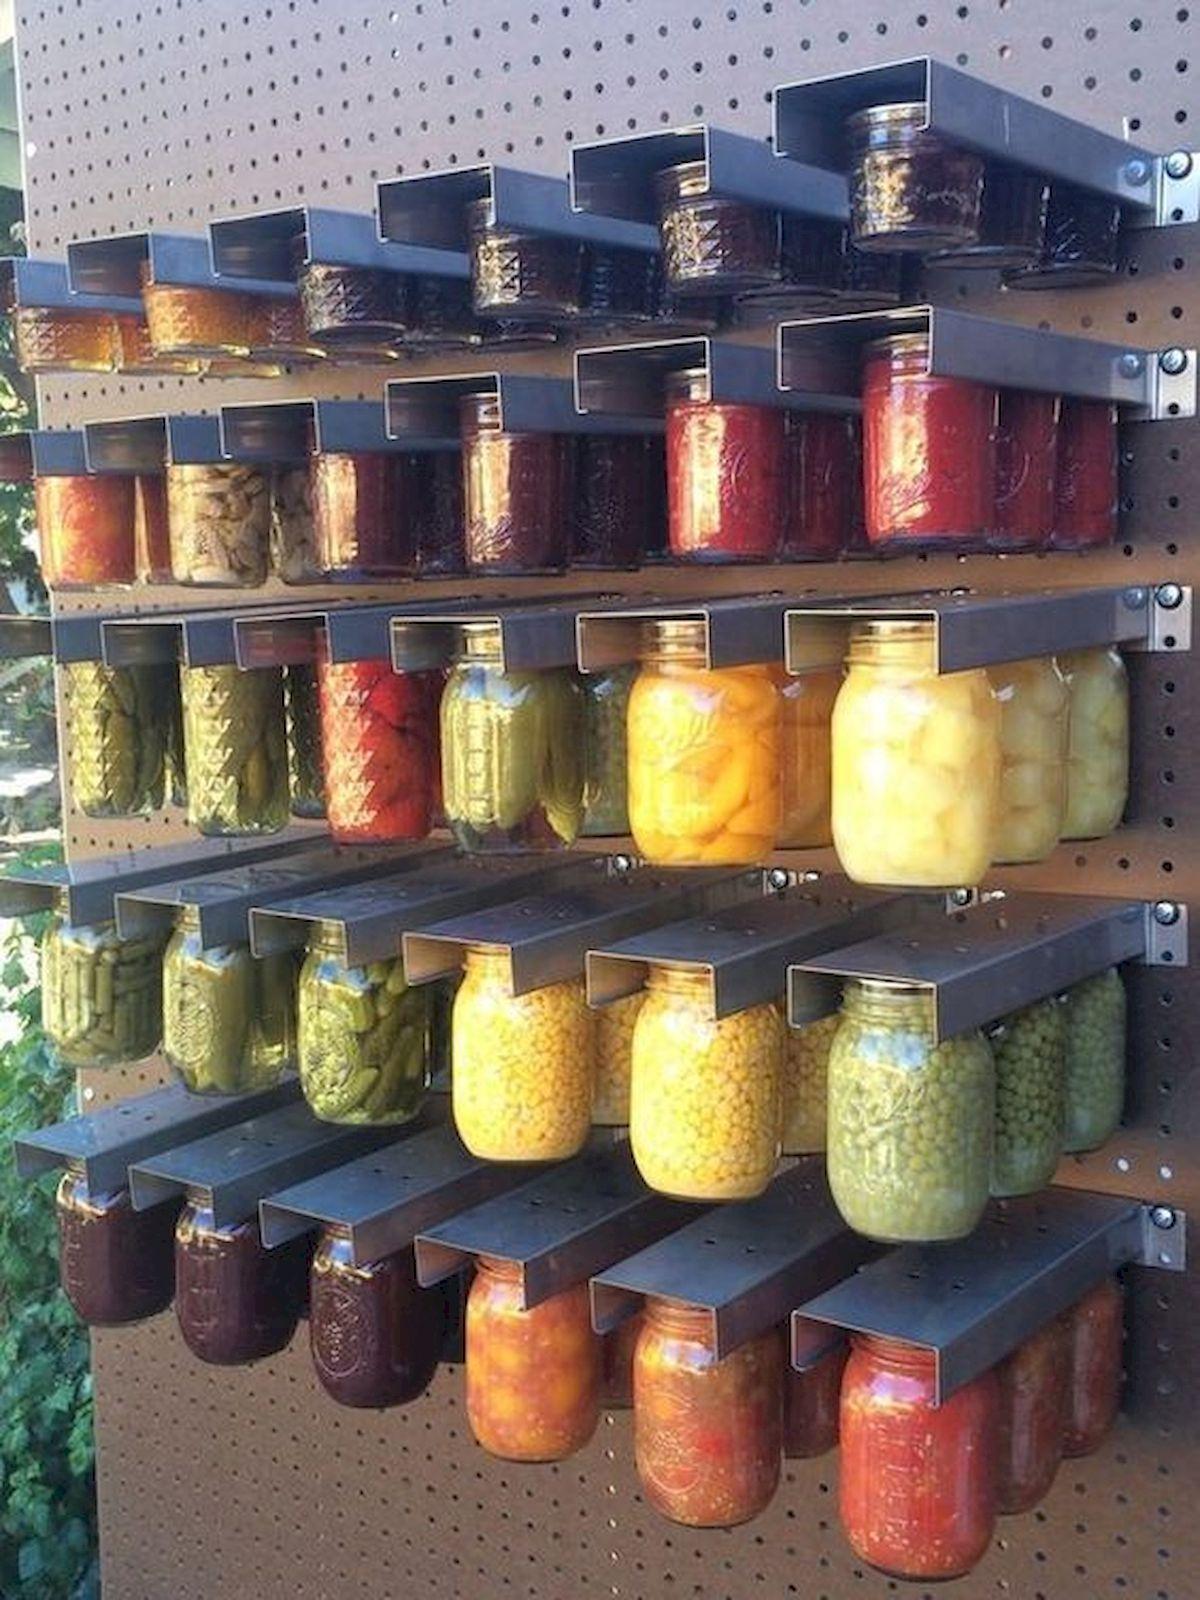 80 Lovely Diy Projects Furniture Kitchen Storage Design Ideas Mason Jar Hanger Mason Jar Storage Canning